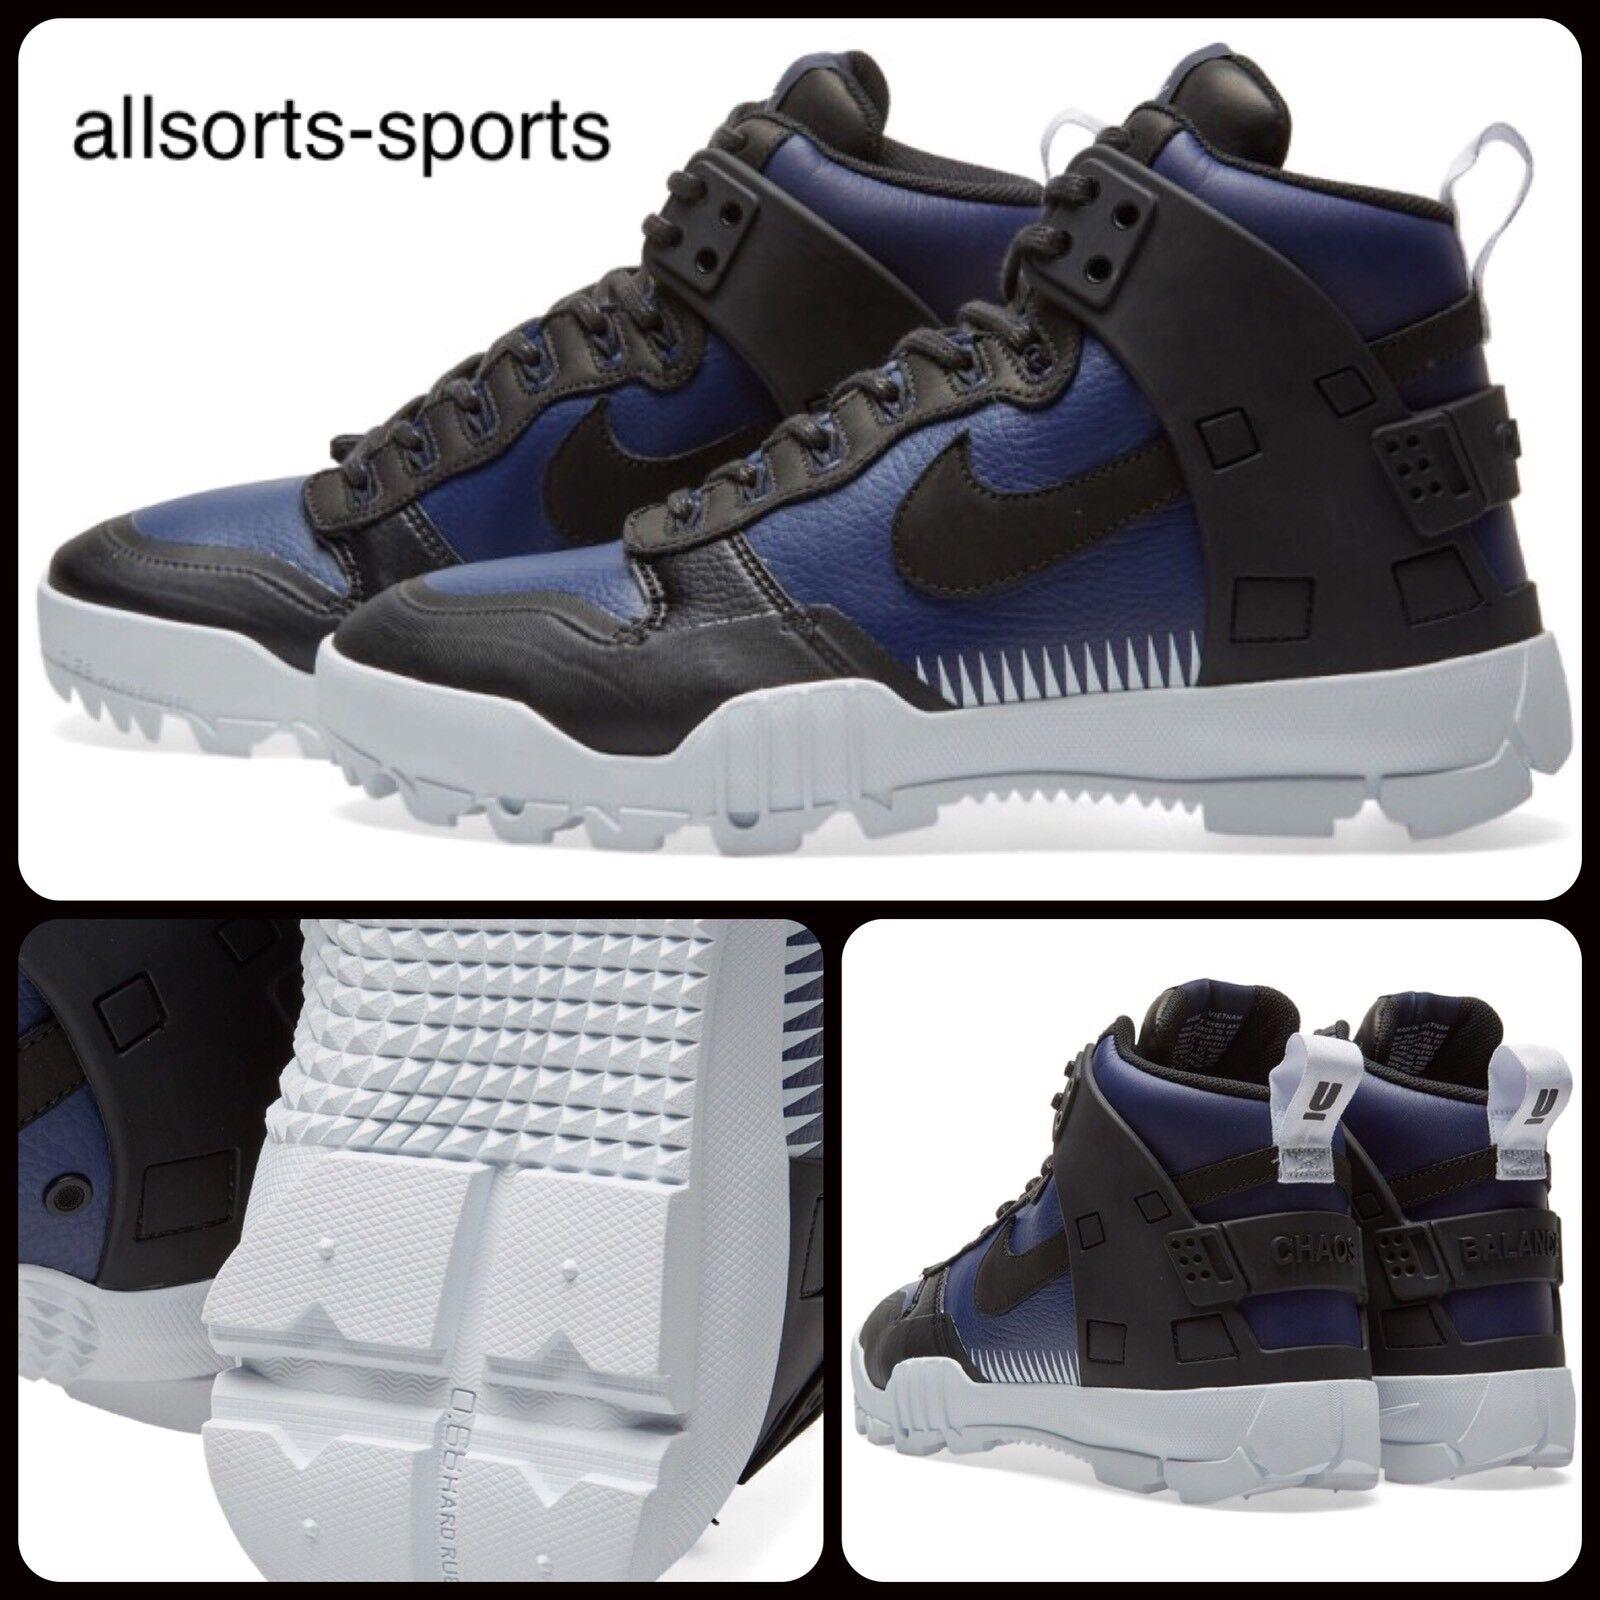 Nike NikeLab SFB Jungle Dunk Undercover 910092-001 Black Loyal Blue